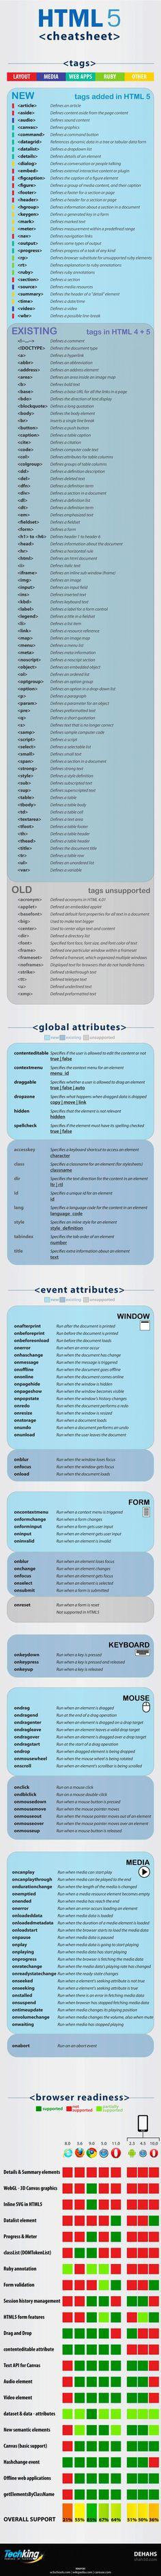 Chuleta con los tags de HTML5